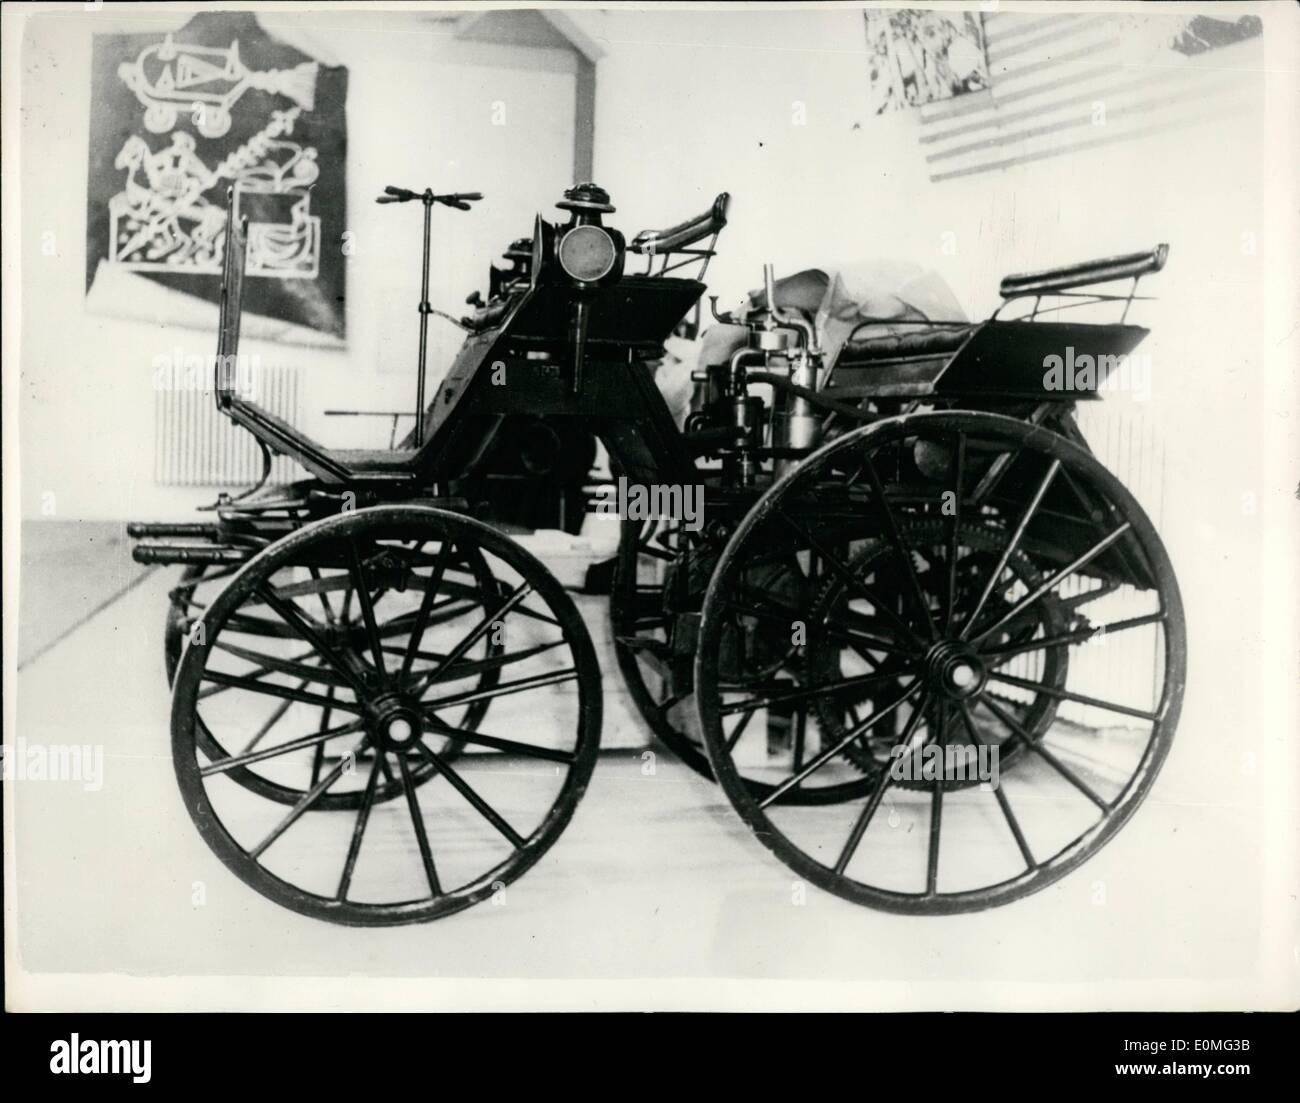 Cool First Car Company In World Photos - Classic Cars Ideas - boiq.info